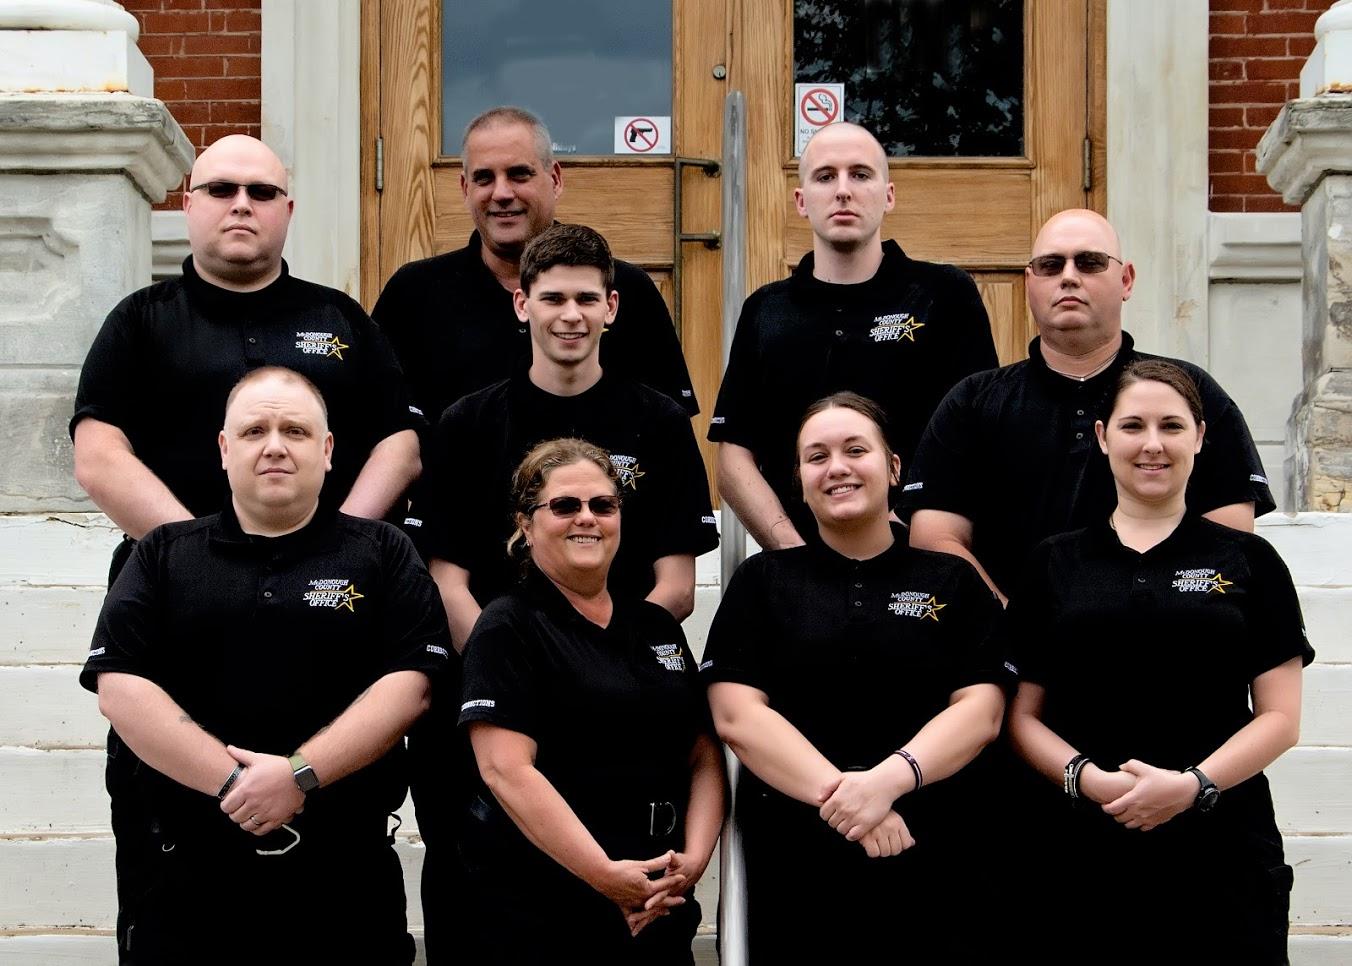 Corrections Staff